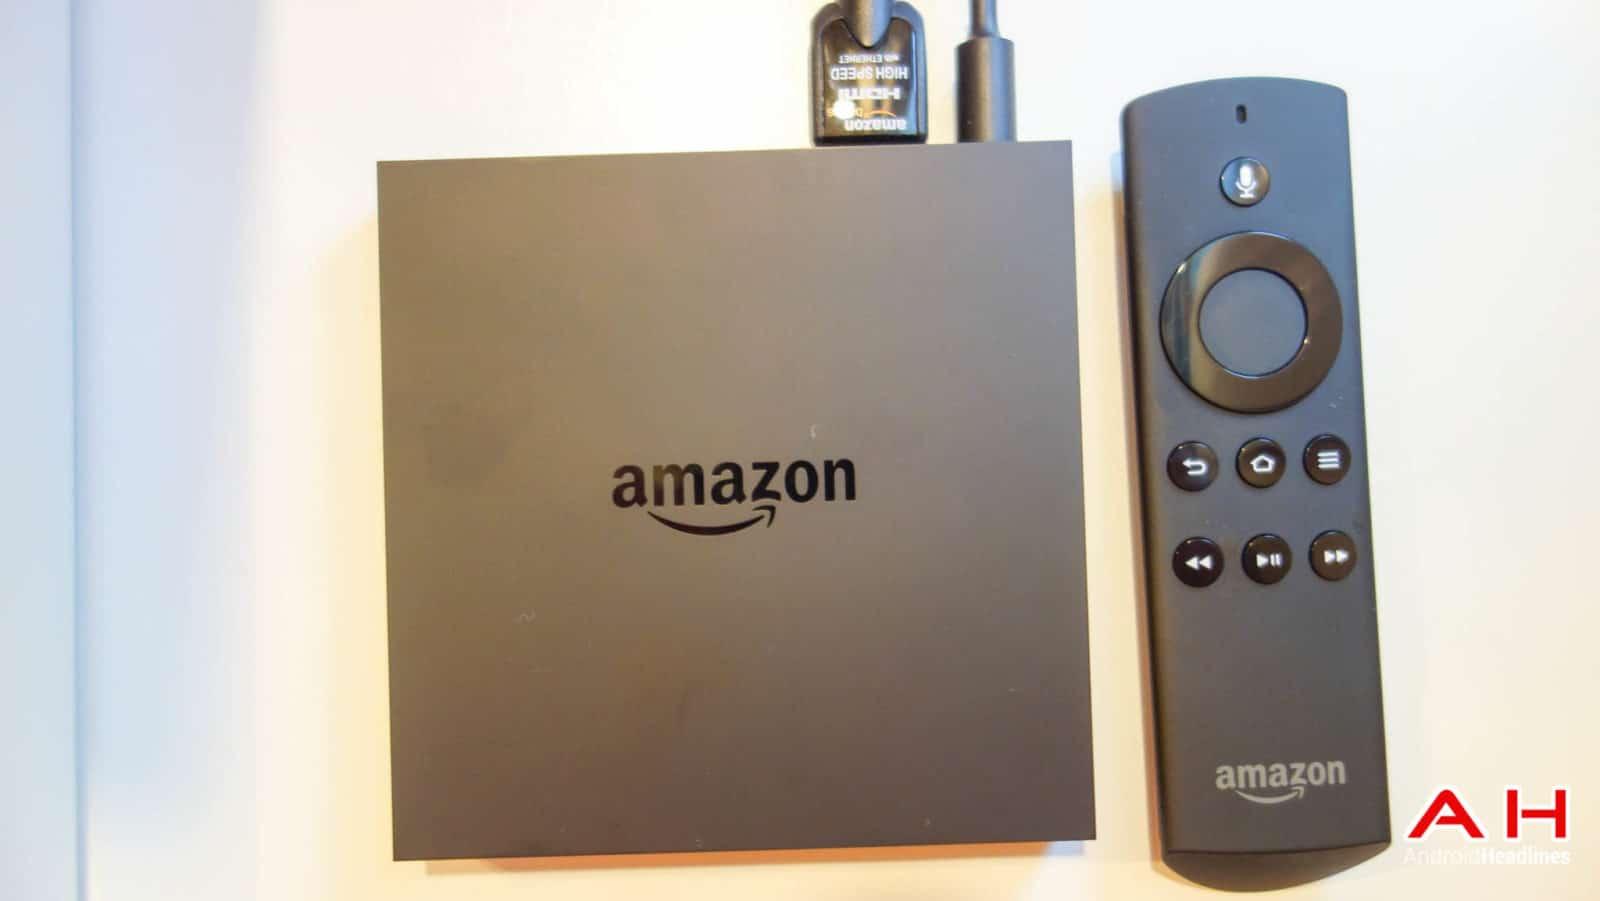 Amazon-Fire-TV-Review-AH-2